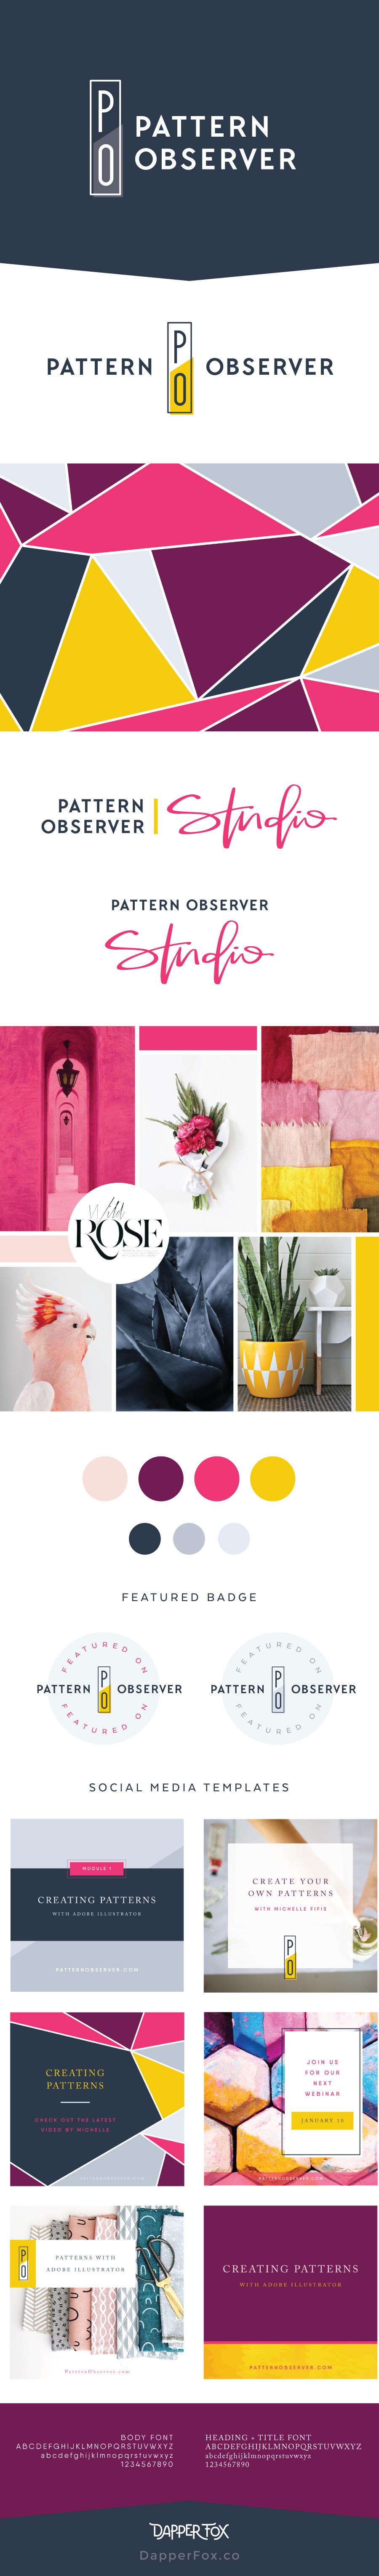 Pattern Observer Logo and Brand Design by Dapper Fox - Feminine, Modern, Colorful, Handwritten Logo, Script Font, Pink, Purple, Yellow Color Scheme